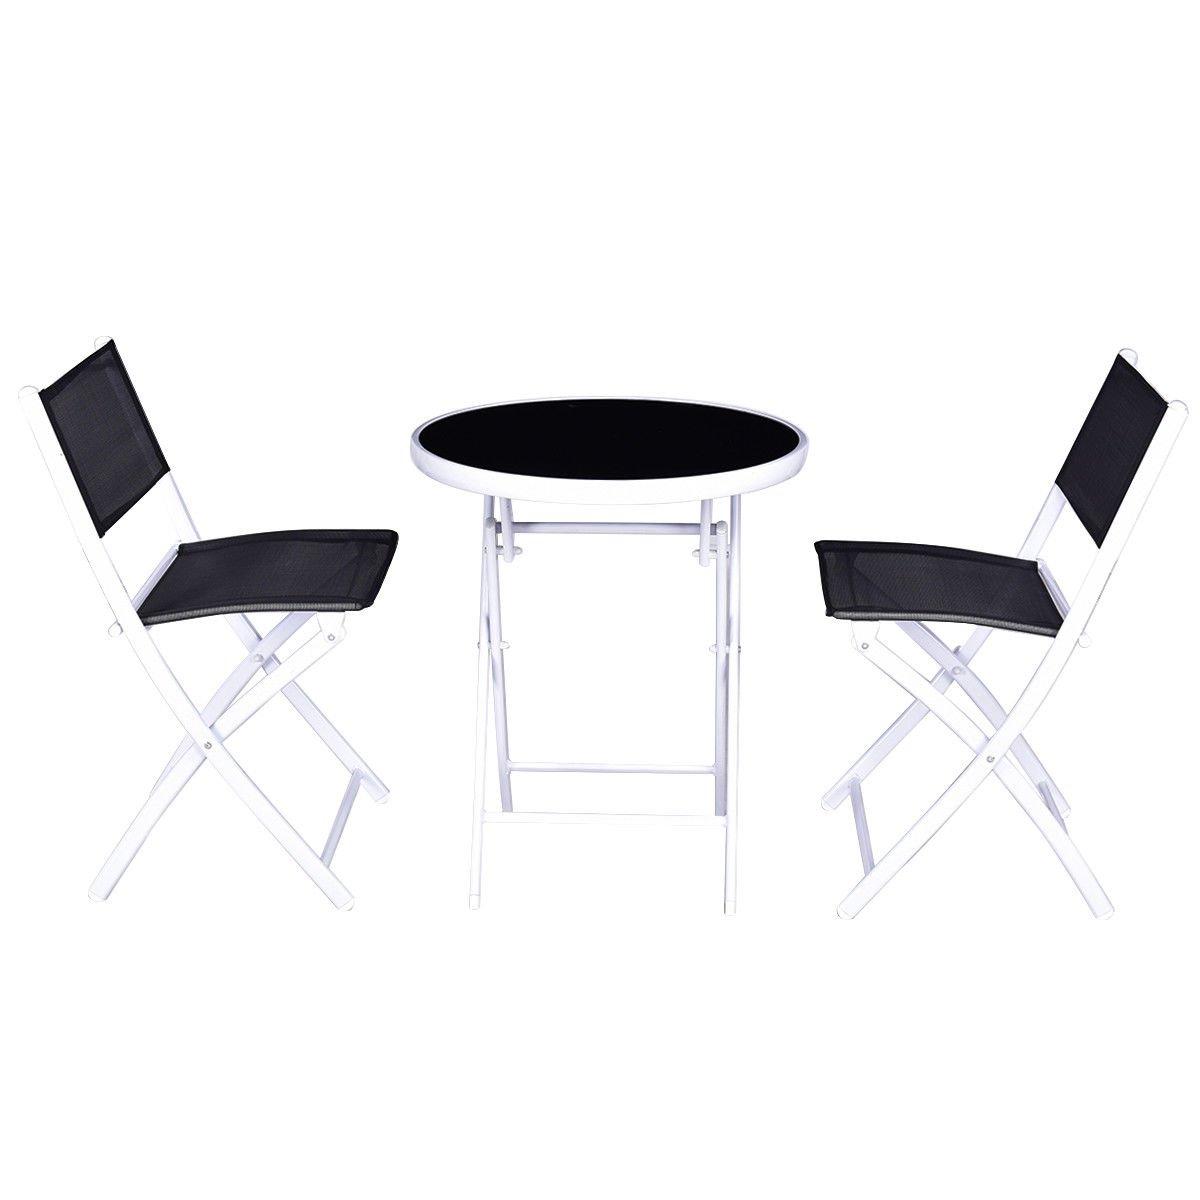 Folding Bistro Table Chairs Set Garden Backyard Patio Furniture Black 3 PCS